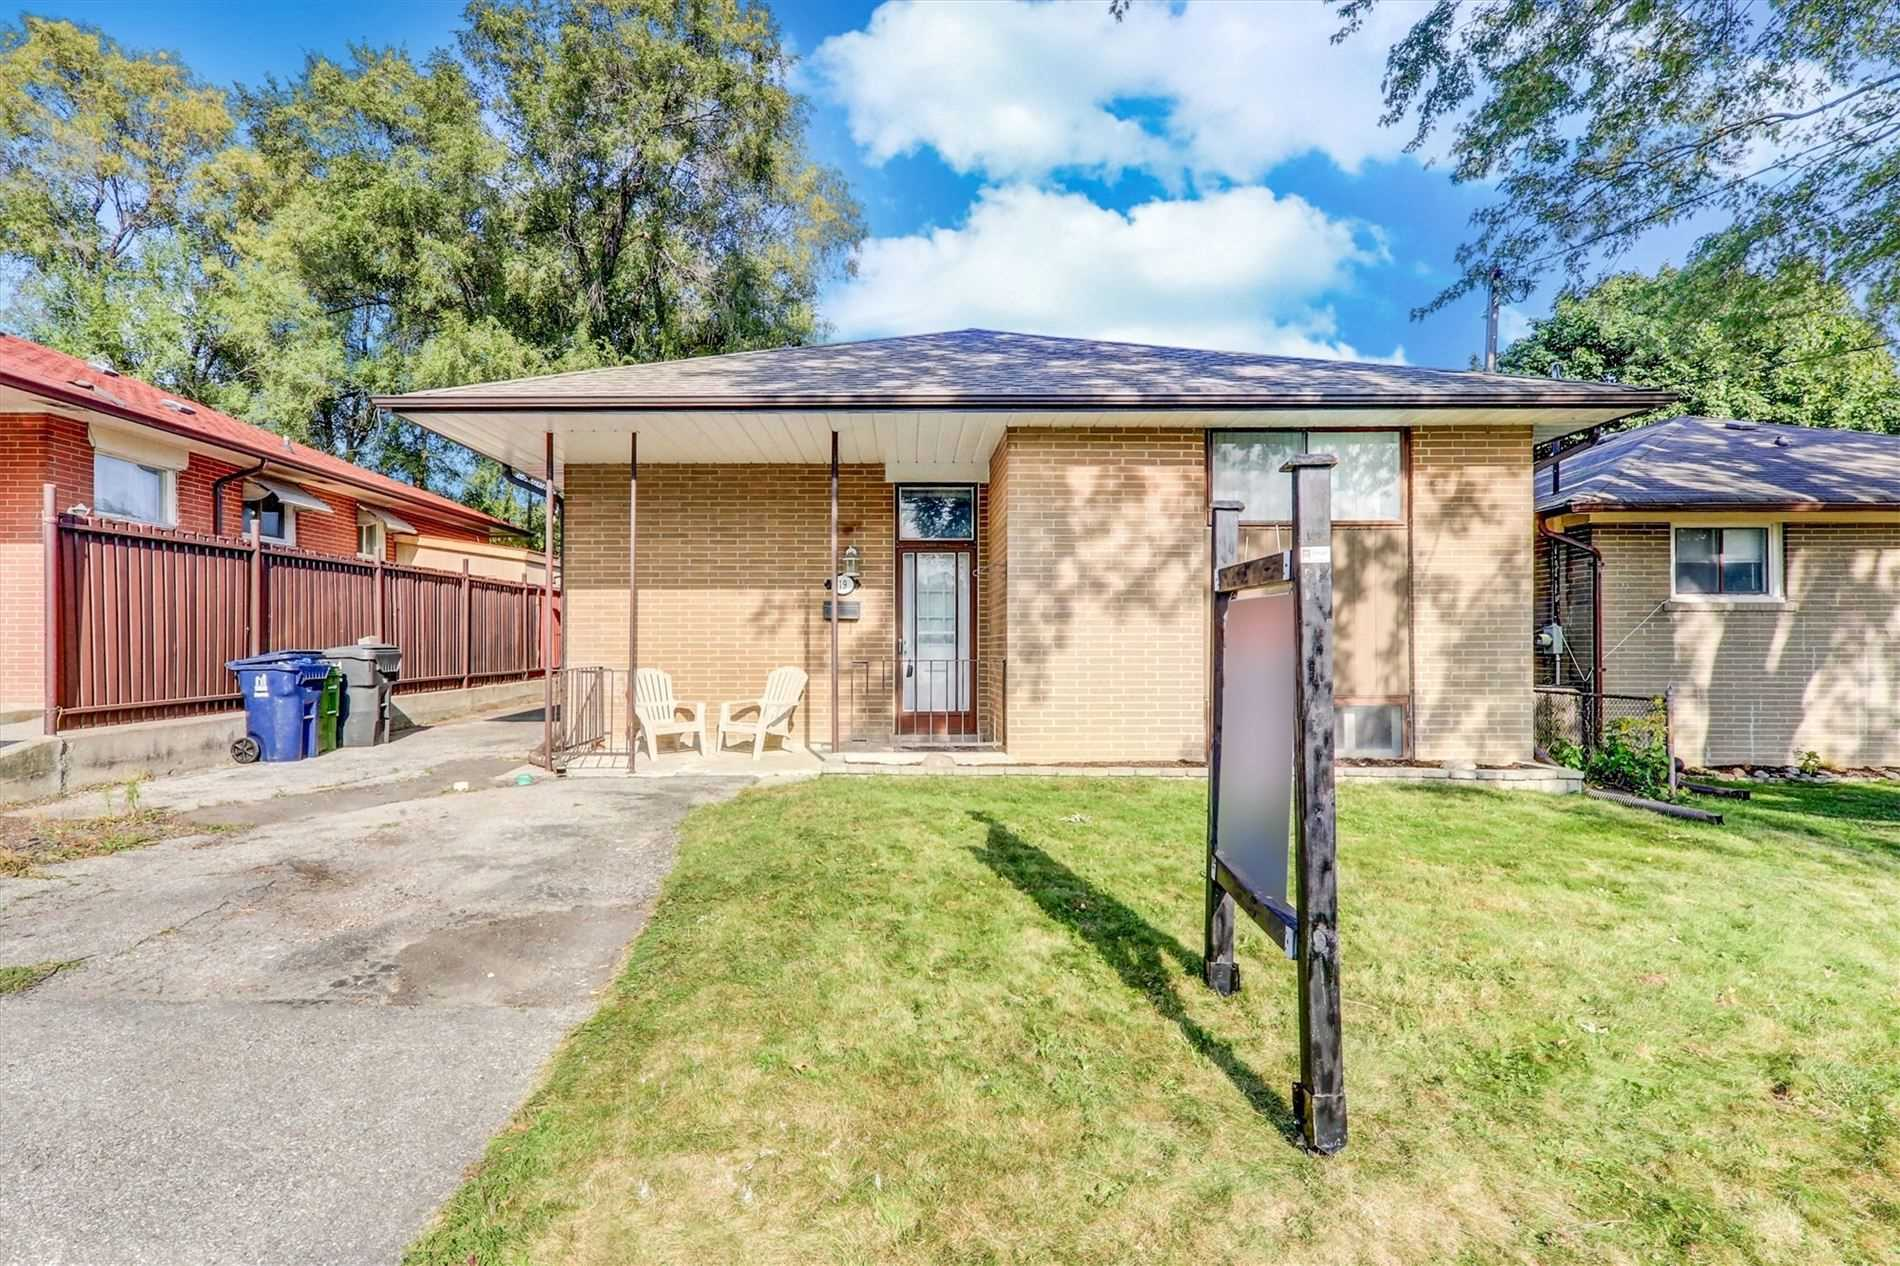 19 Lakeland Cres, Toronto, Ontario M1G2L4, 3 Bedrooms Bedrooms, 6 Rooms Rooms,2 BathroomsBathrooms,Detached,For Sale,Lakeland,E4924340